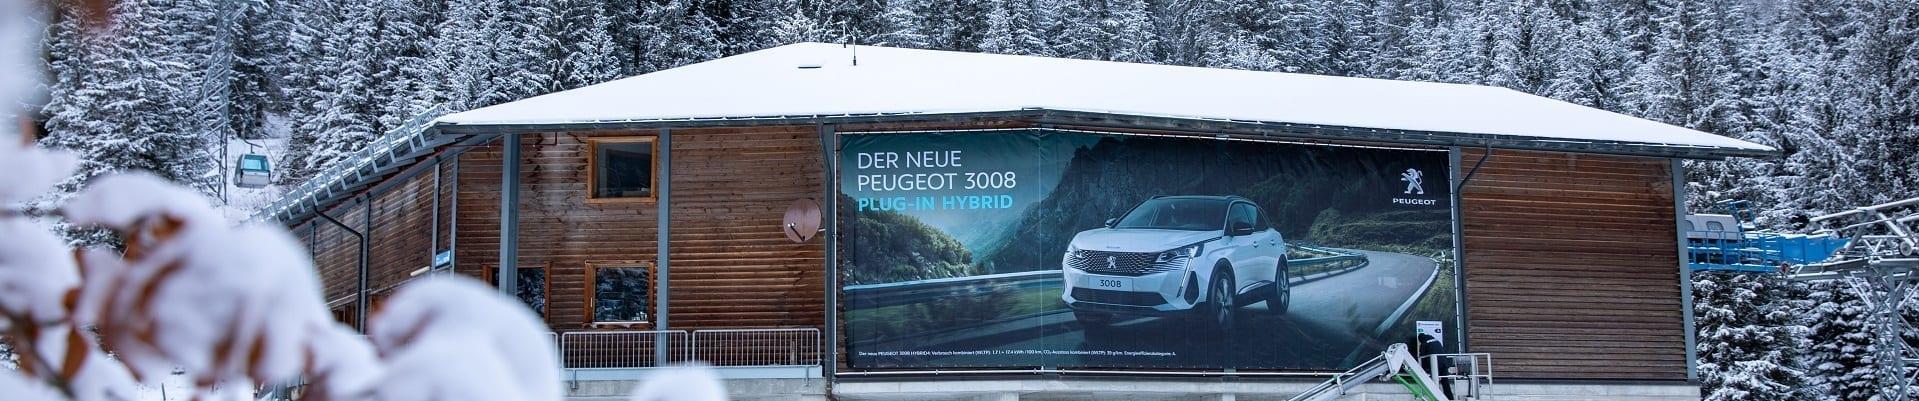 Partnerschaft mit Peugeot der Bergbahnen Adelboden AG